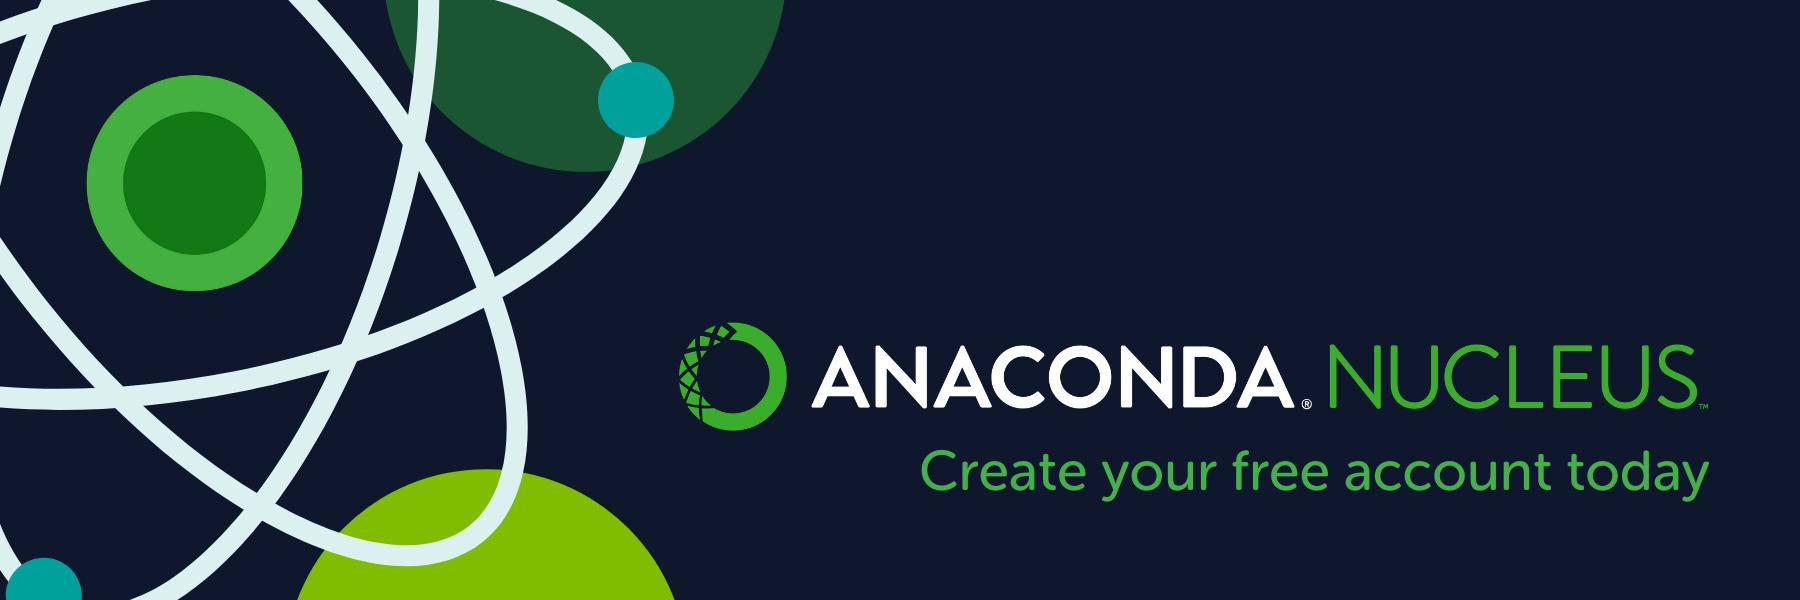 Create your free Anaconda Nucleus account below.